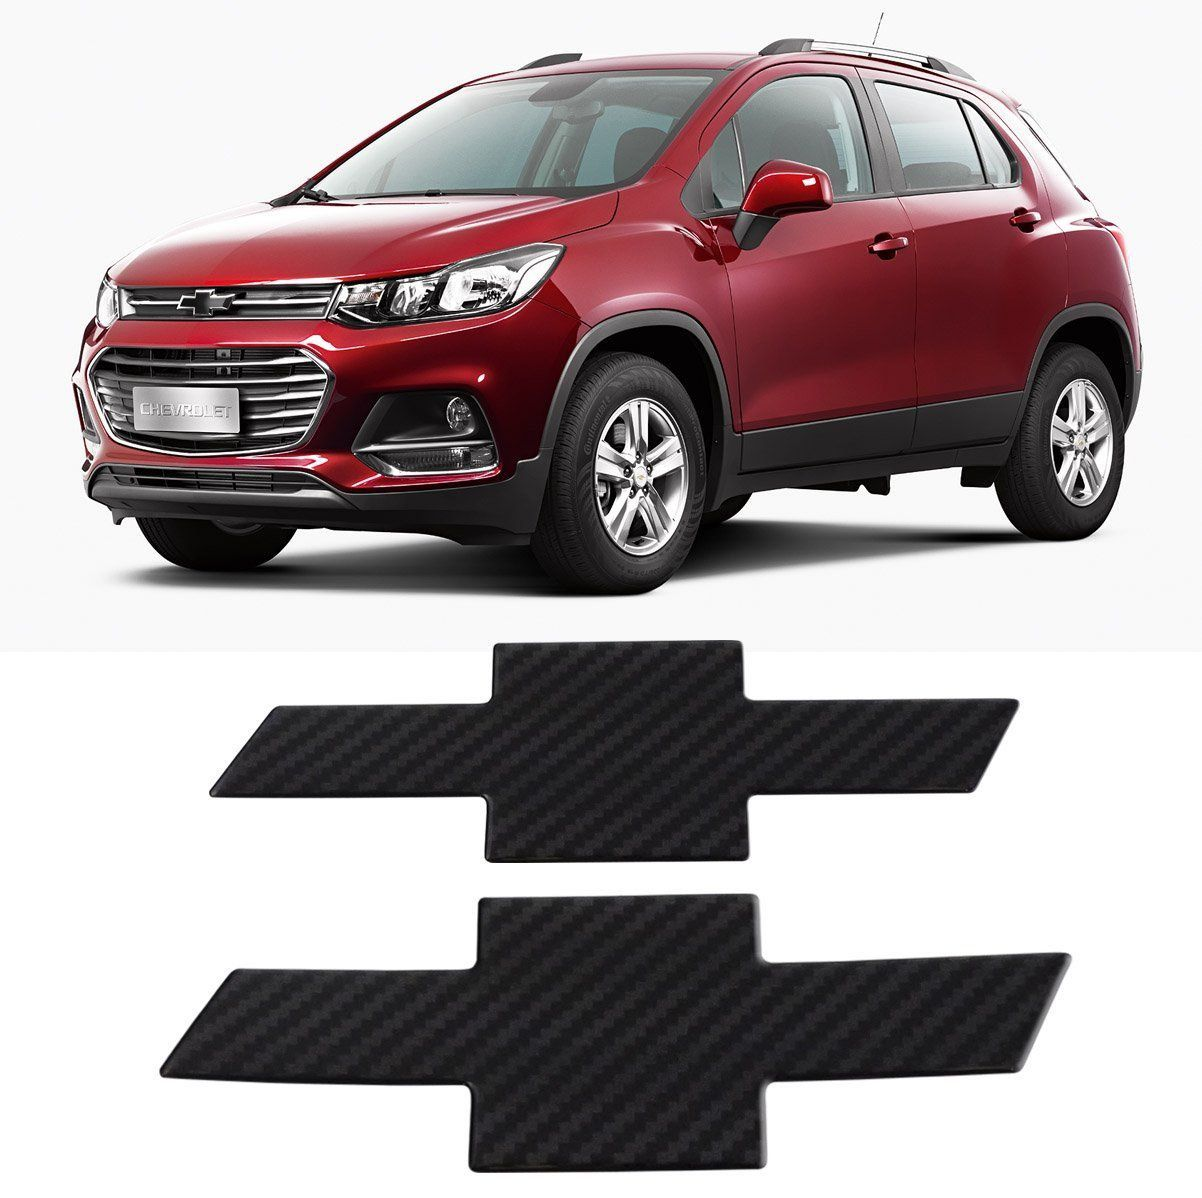 Kit Adesivo Emblema Resinado Carbono Gm Tracker 2017 2018